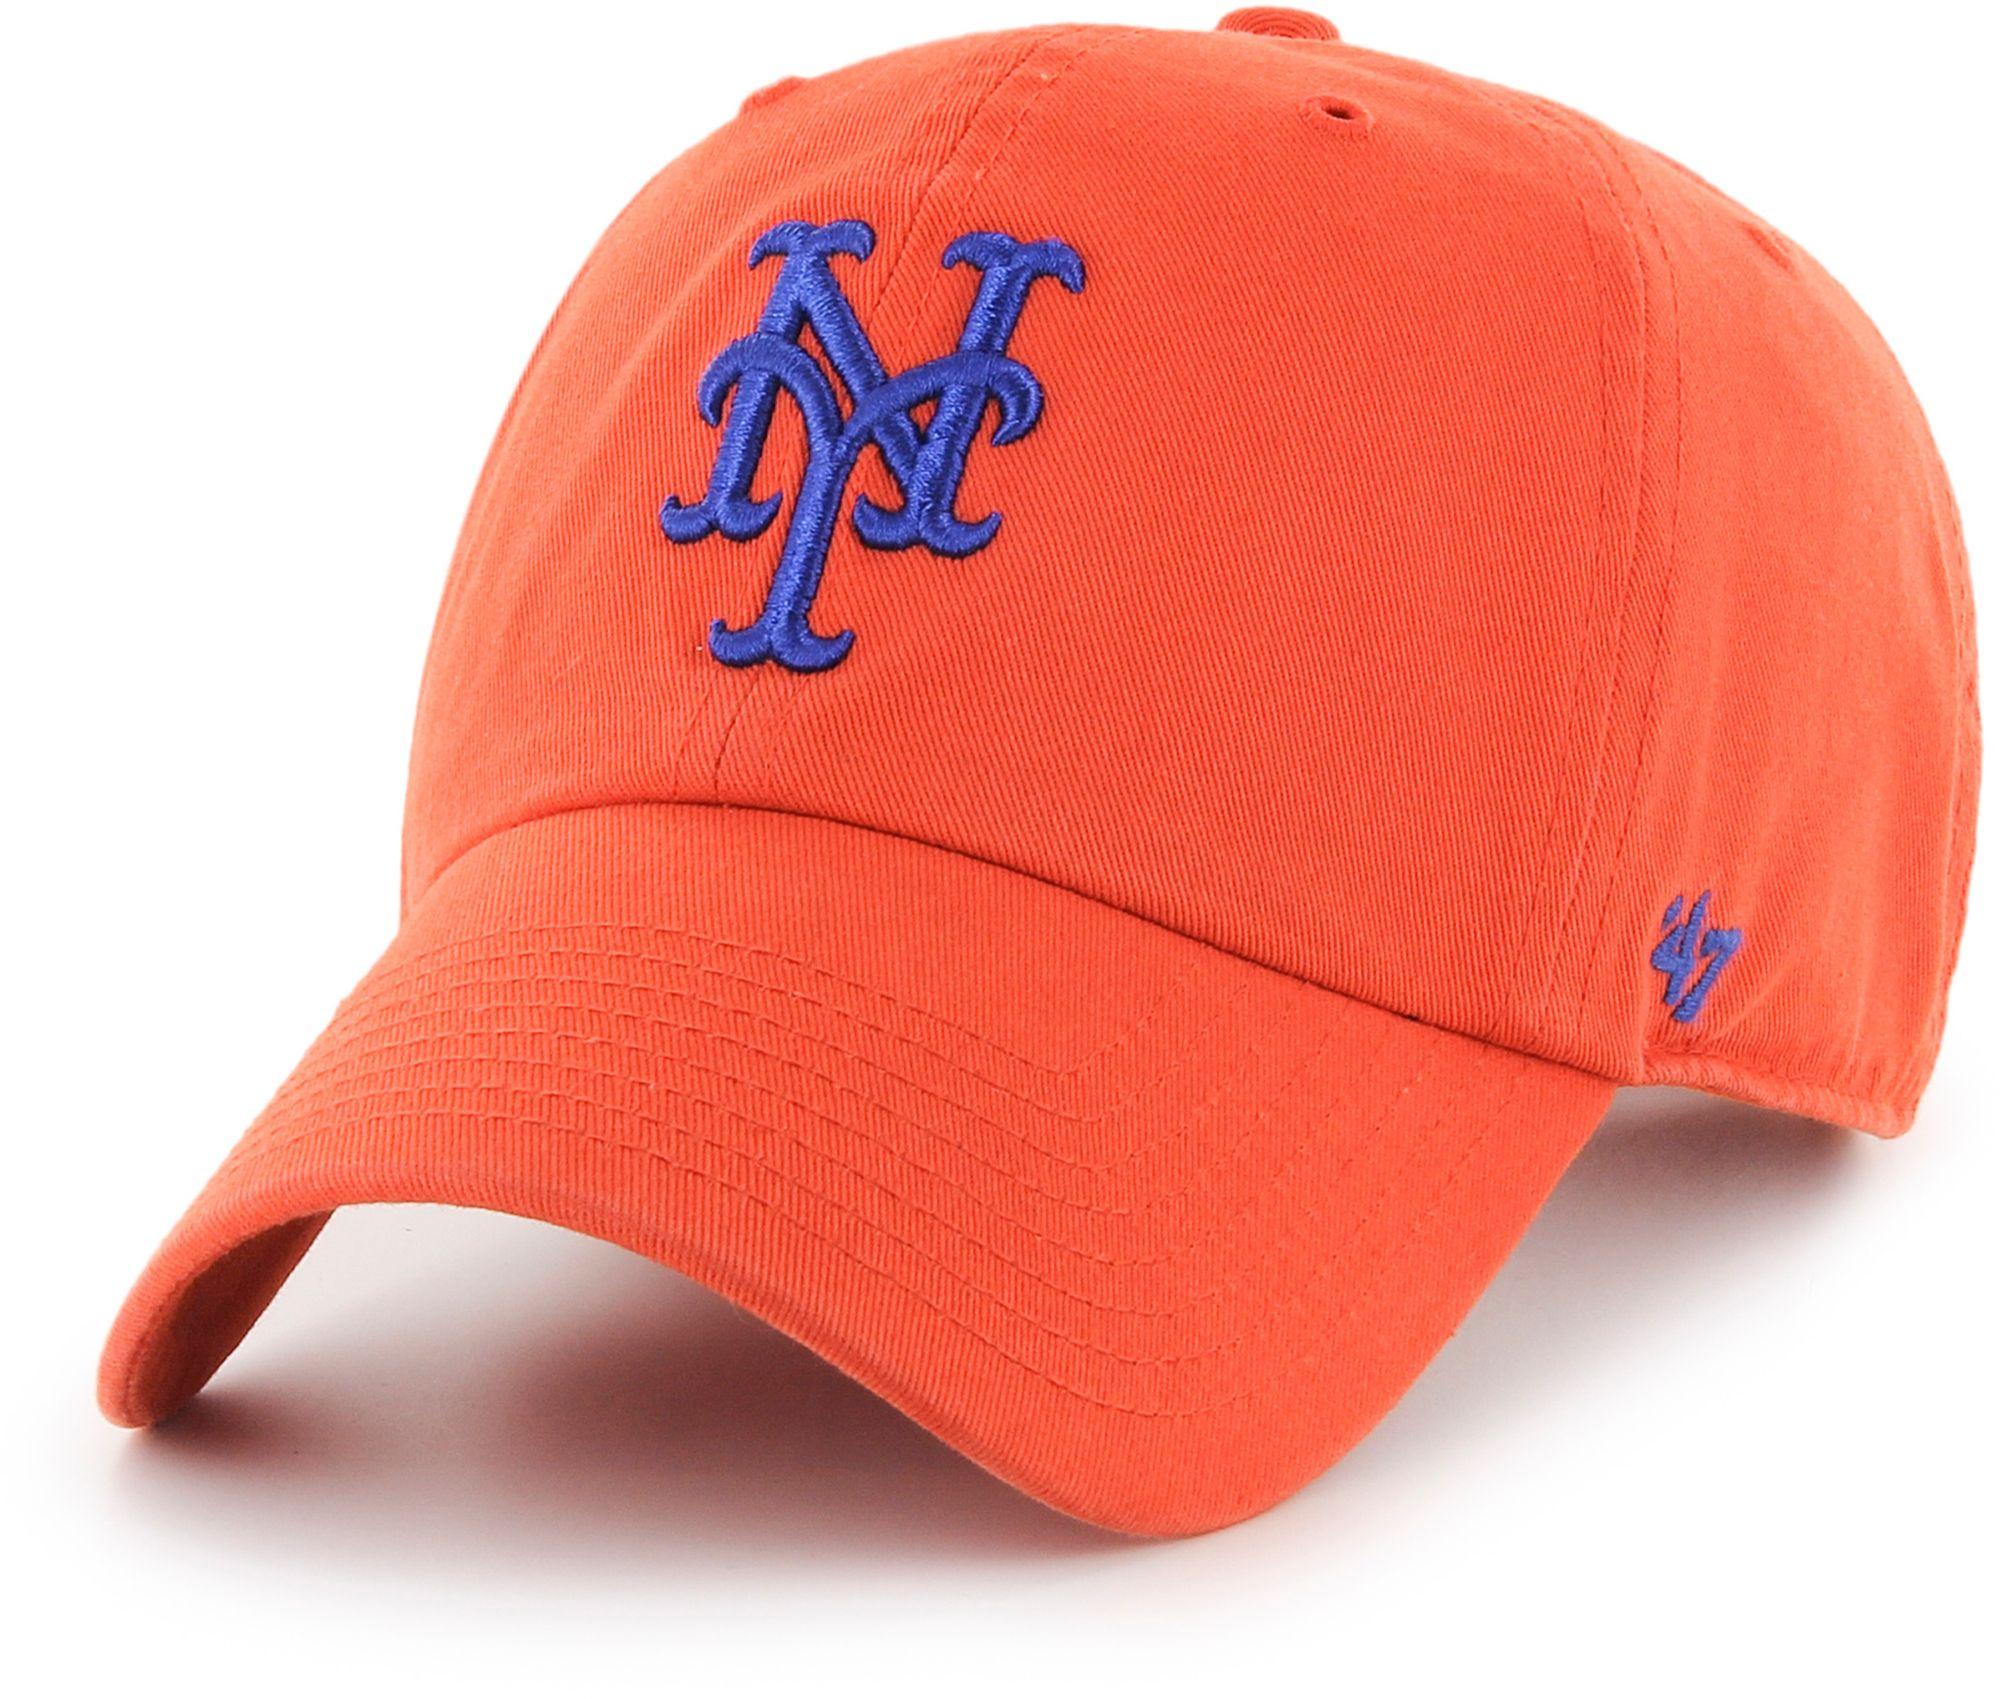 ... shopping 47 mens new york mets clean up orange adjustable hat 38464  6f9e0 123541128584